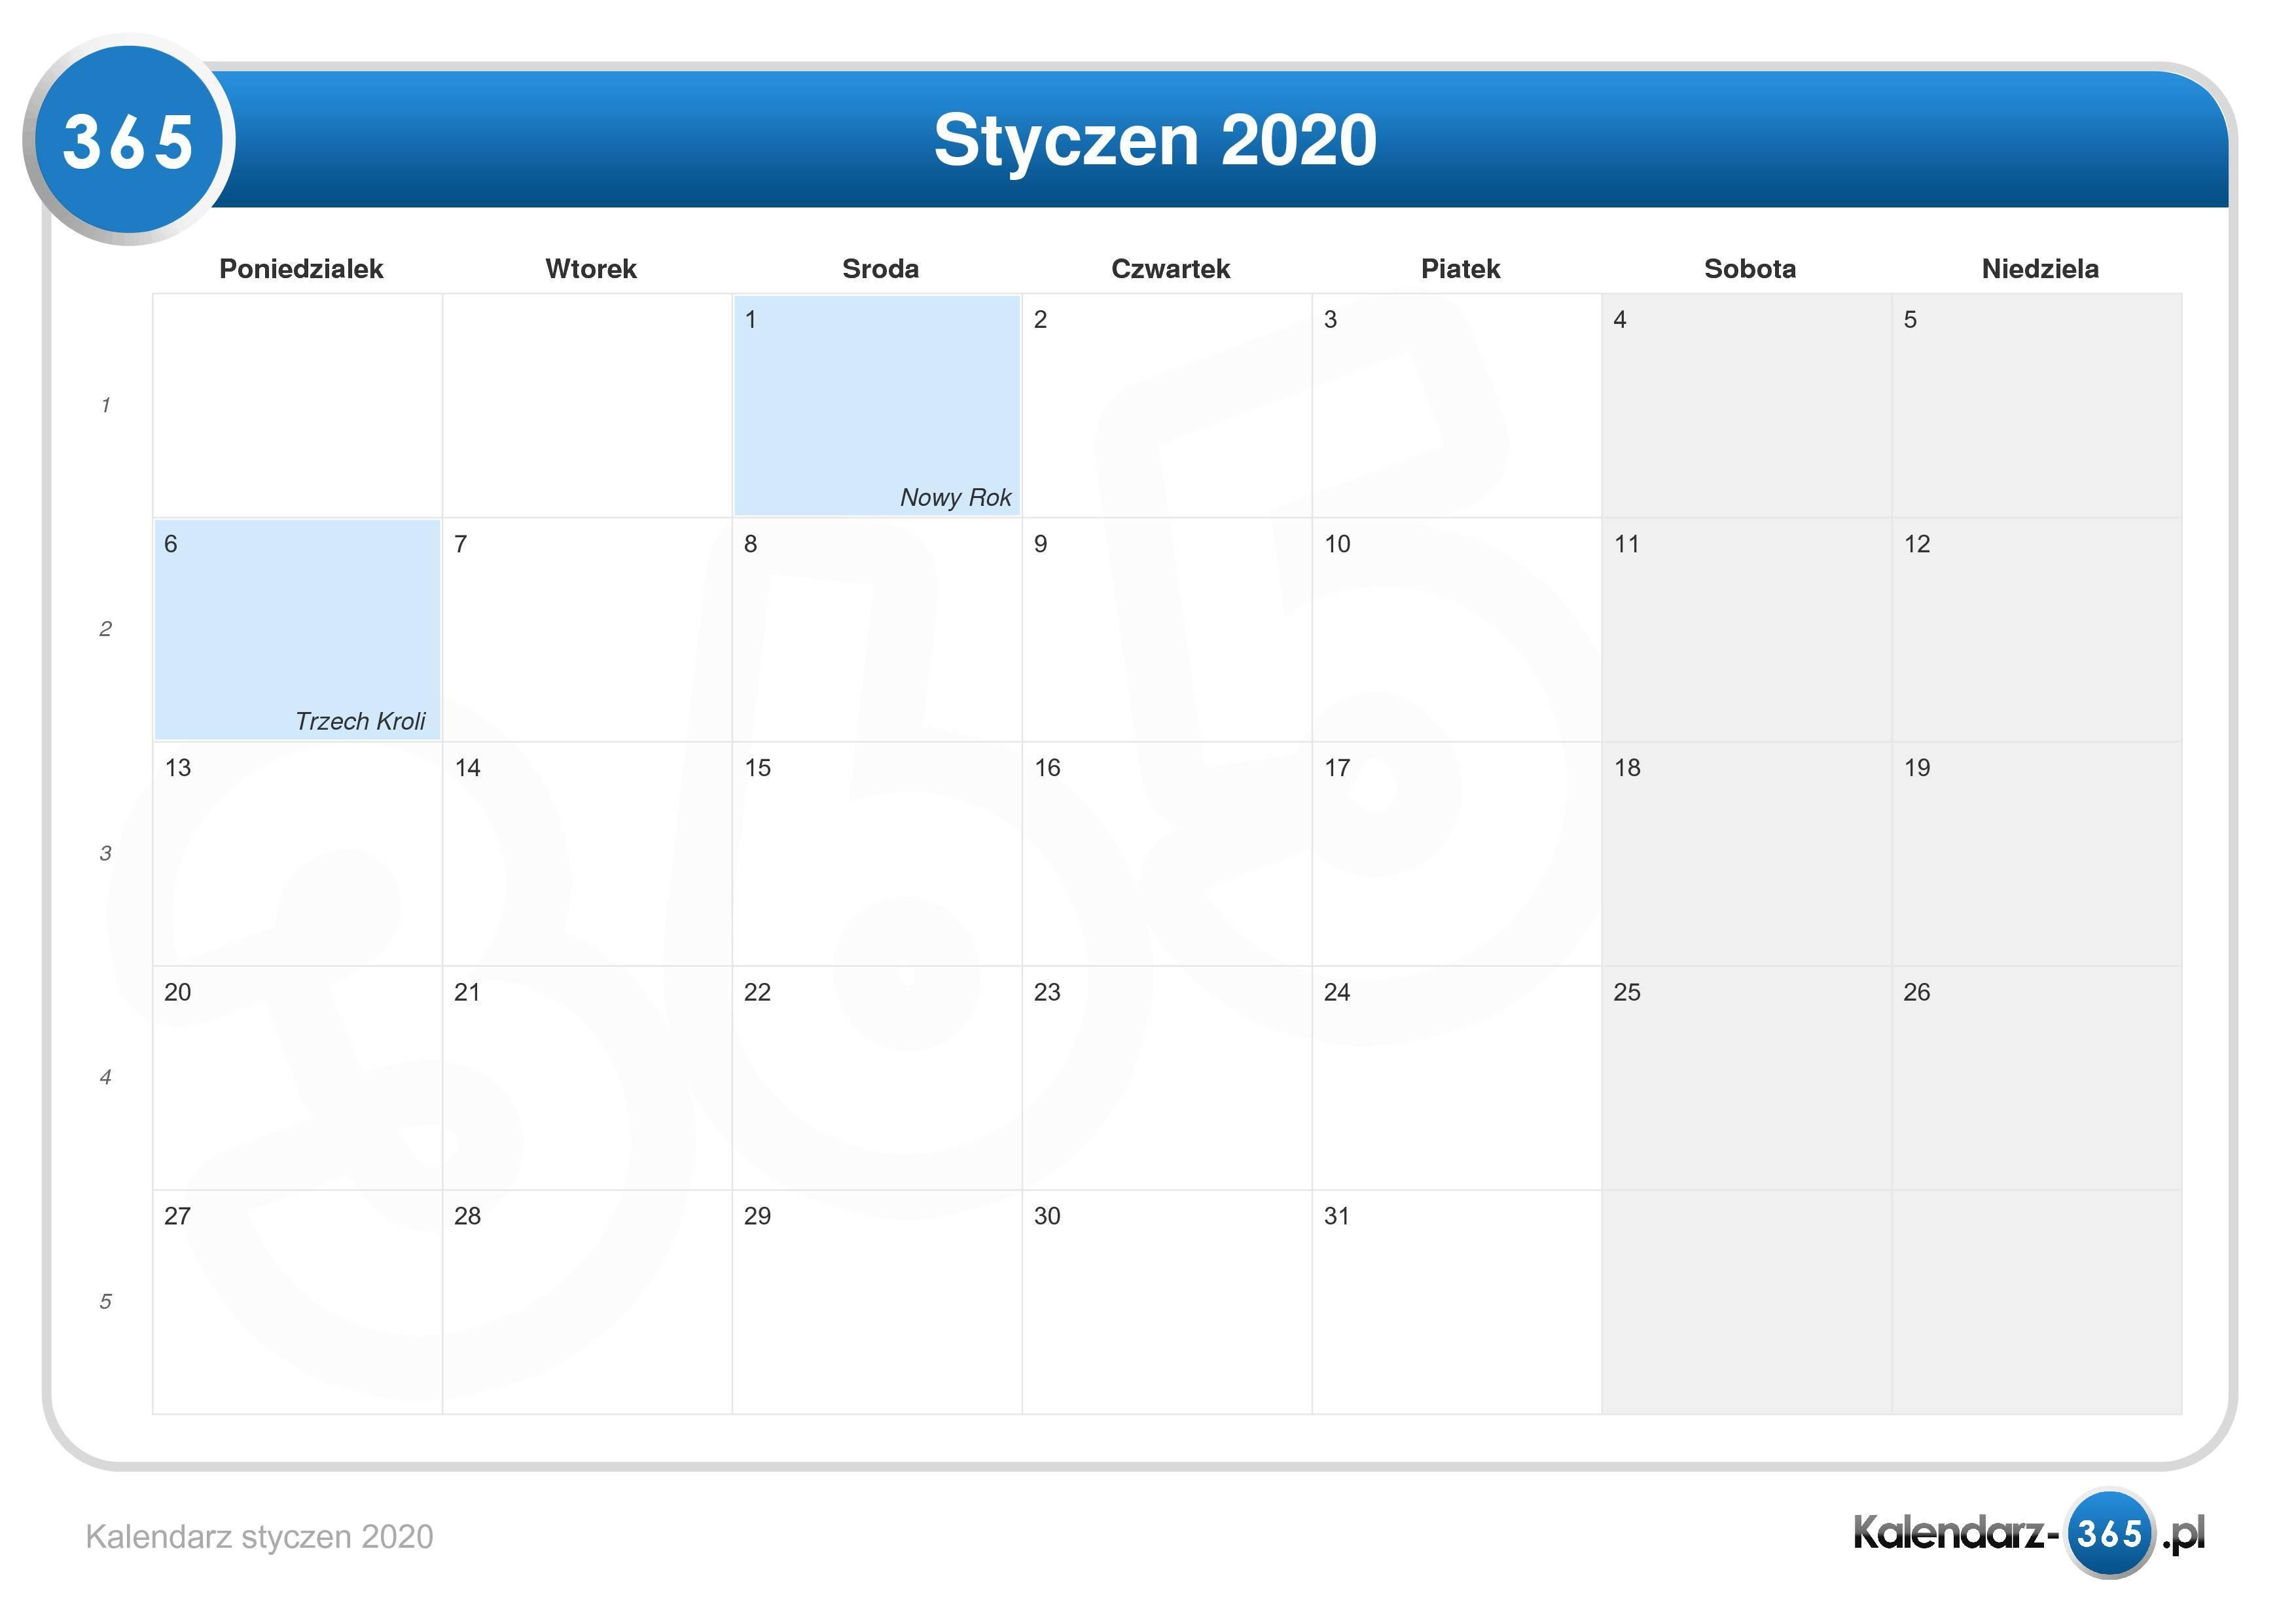 Kalendarz Styczen 2020